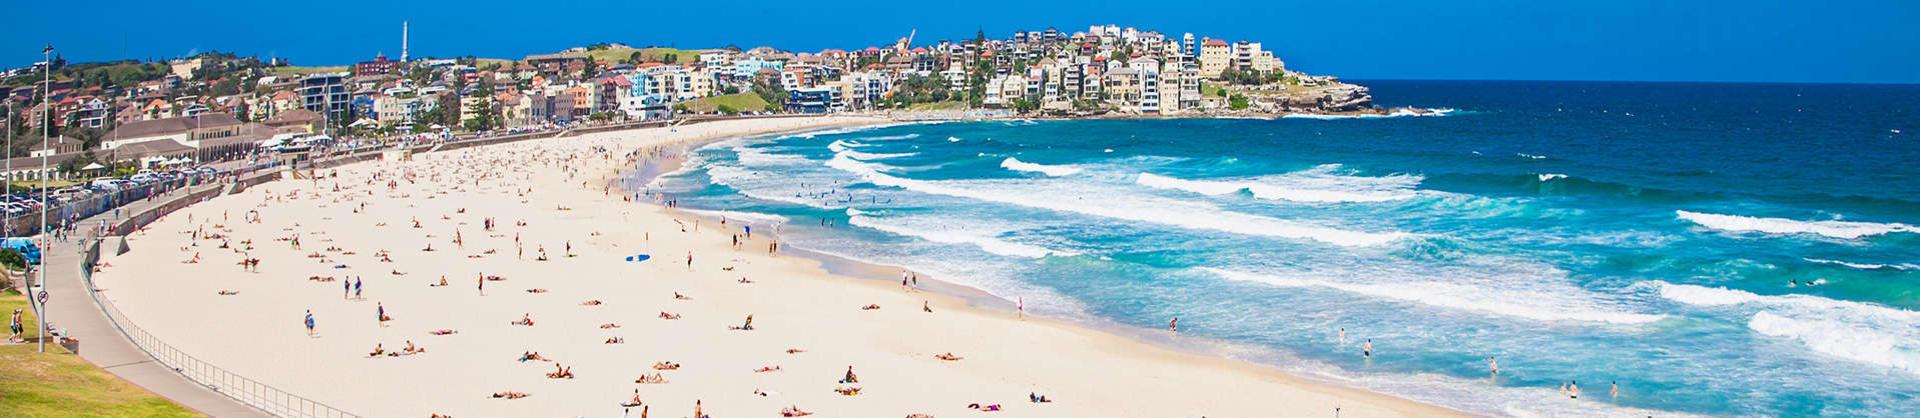 An aerial view of Bondi Beach in Sydney